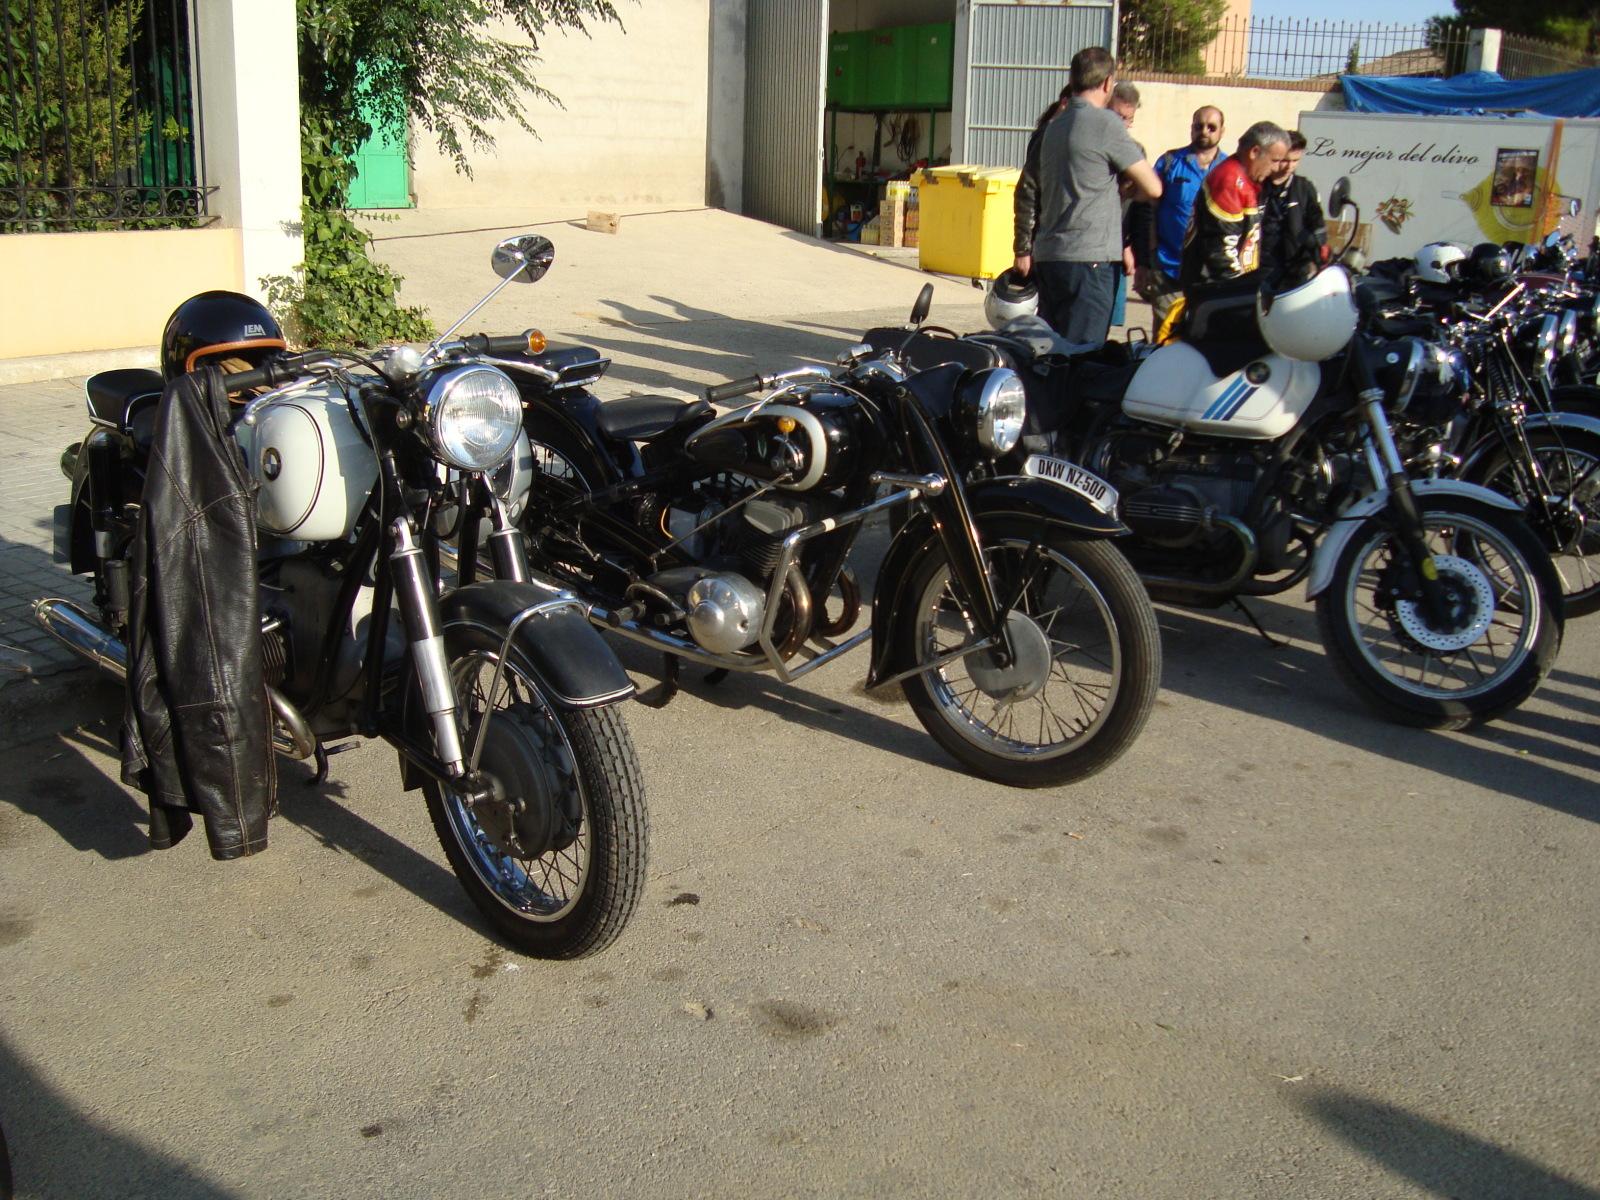 XI concentracion de motos antiguas en Alberuela de tubo (Huesca) 2vuj1au